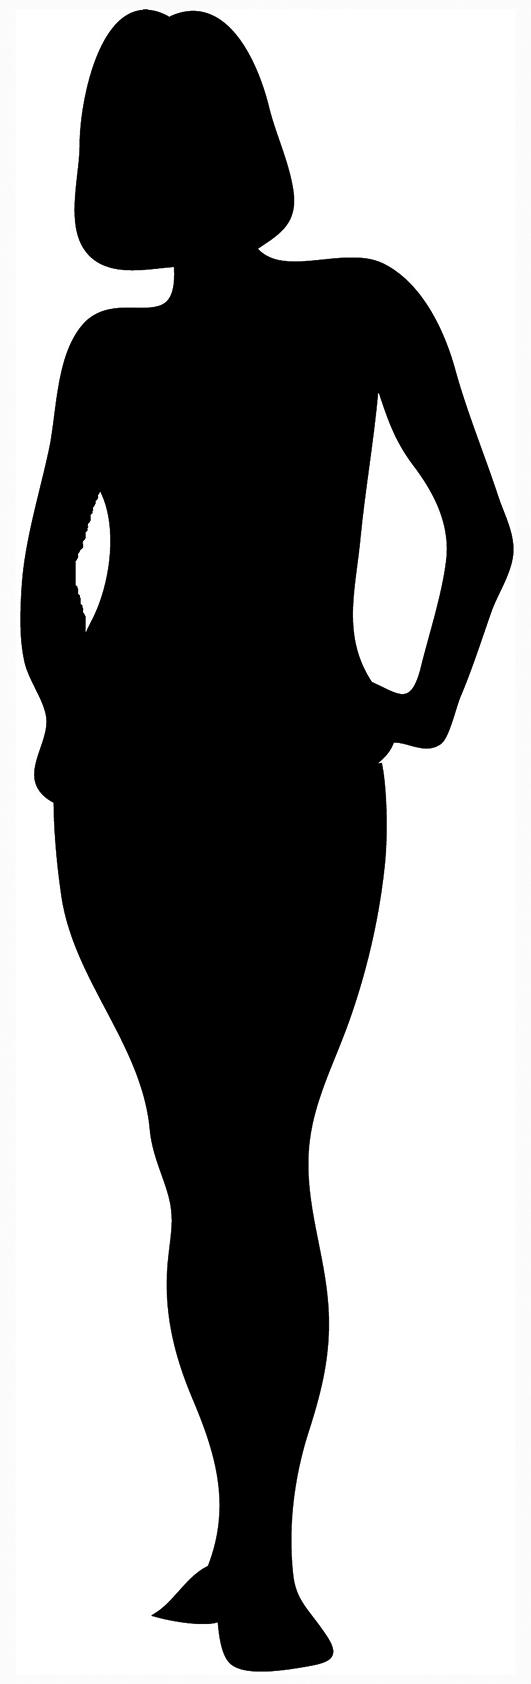 black silhouette of woman standing ...-black silhouette of woman standing ...-6